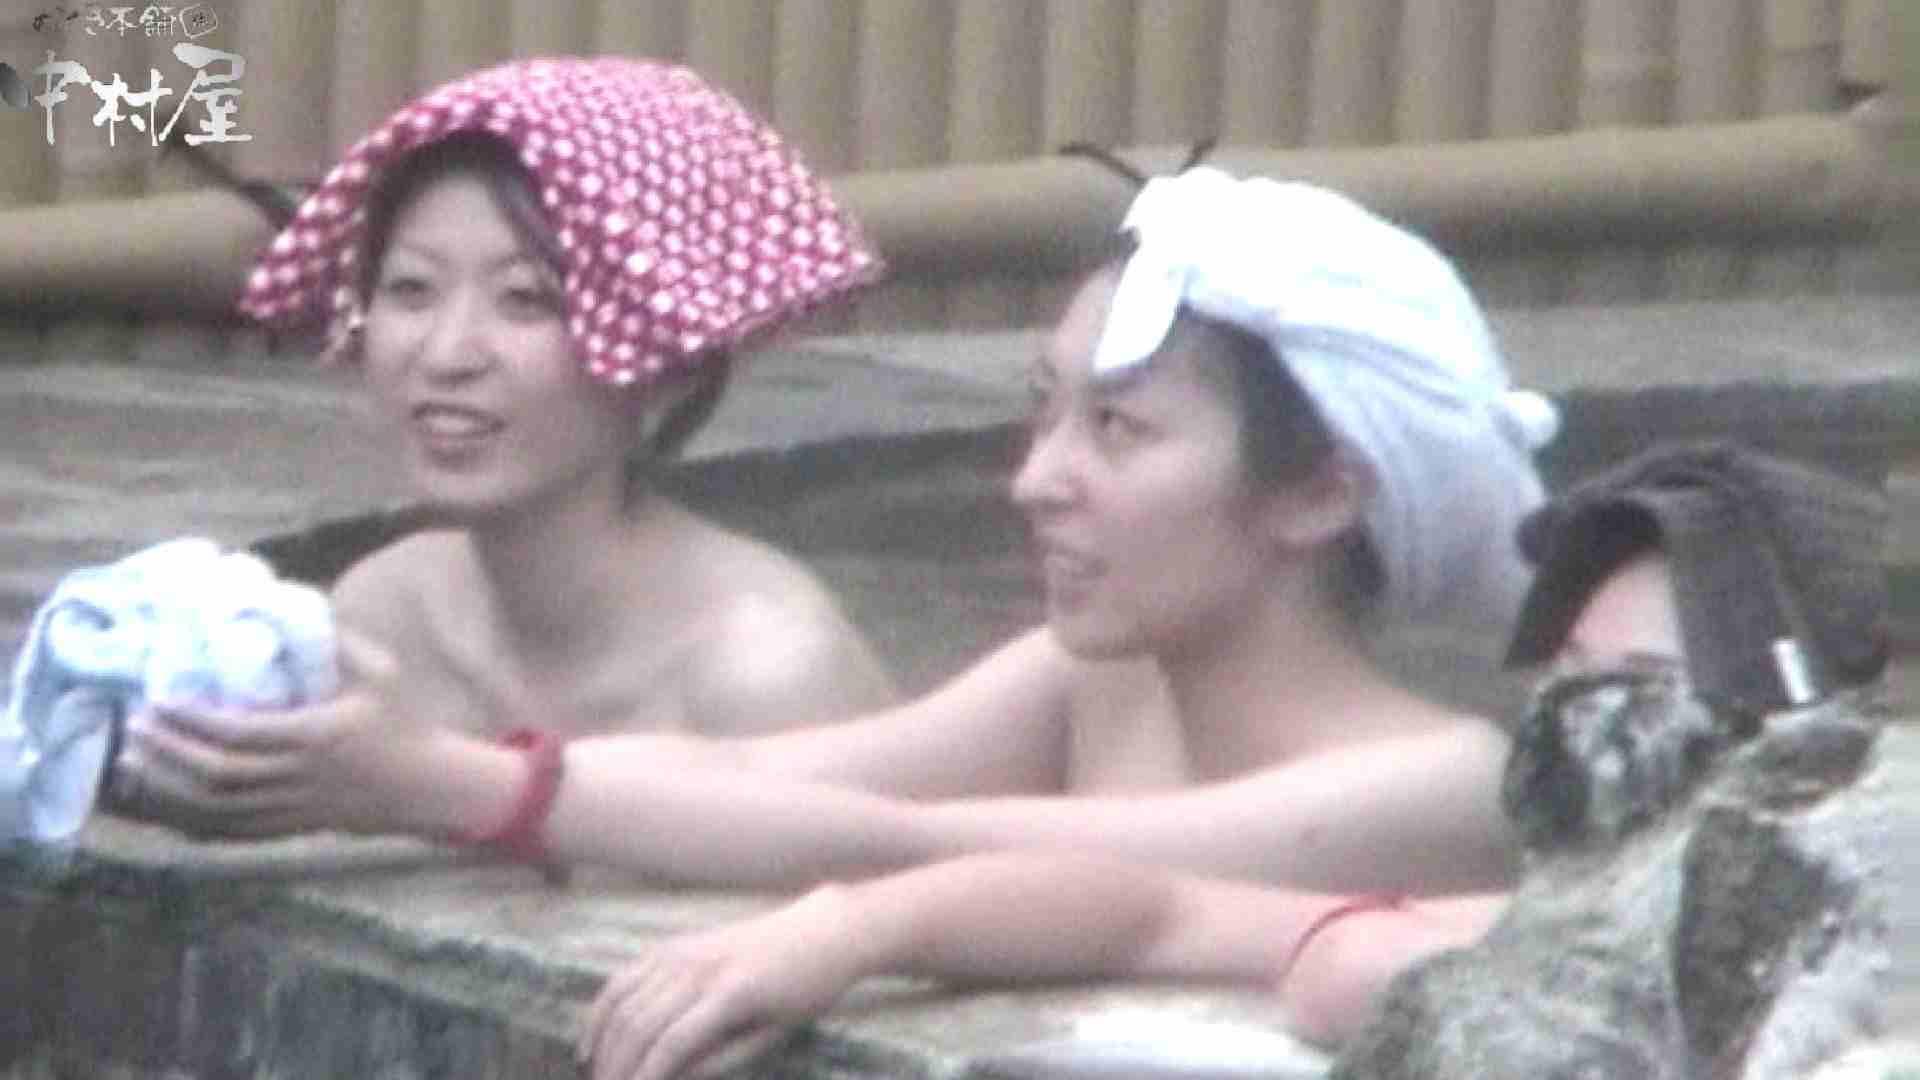 Aquaな露天風呂Vol.554 盗撮師作品  86pic 21